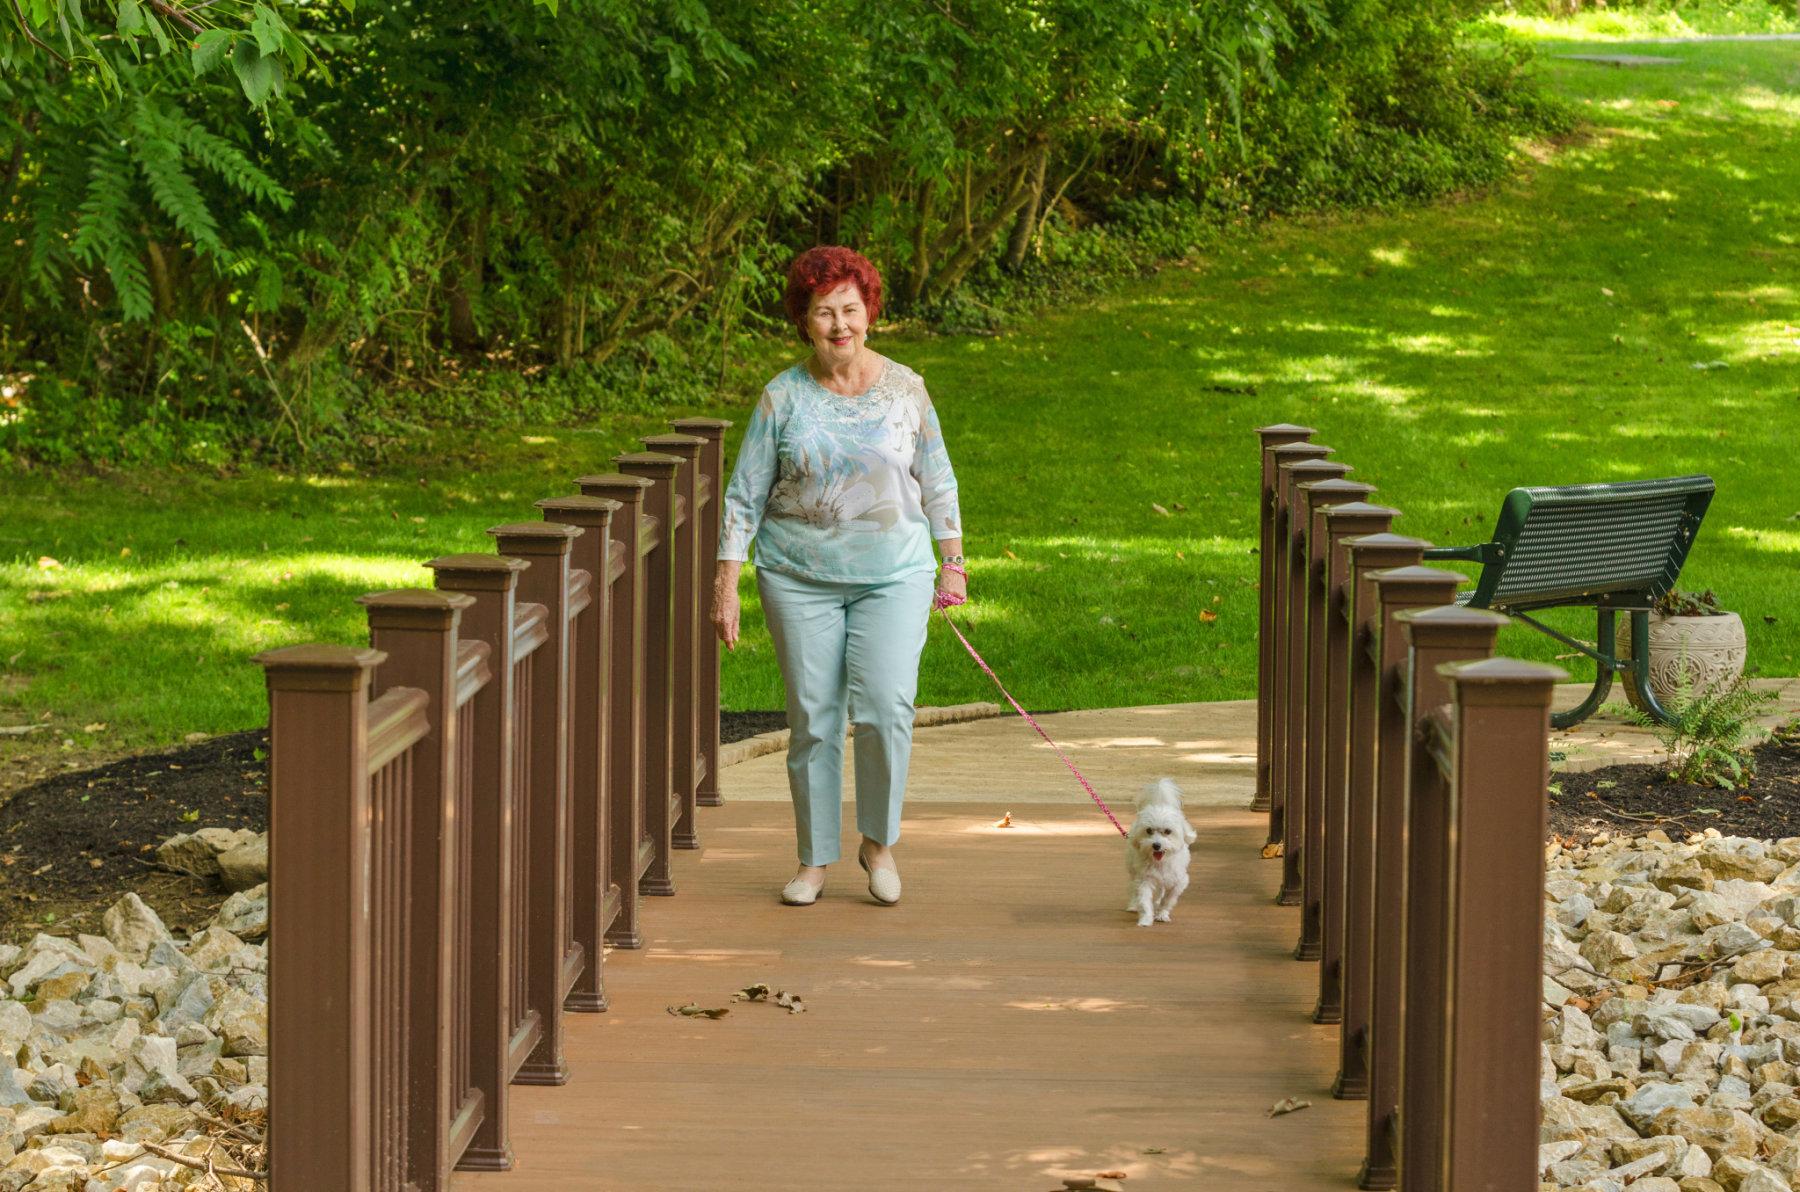 Walking-trail-email-ers_opt.jpg